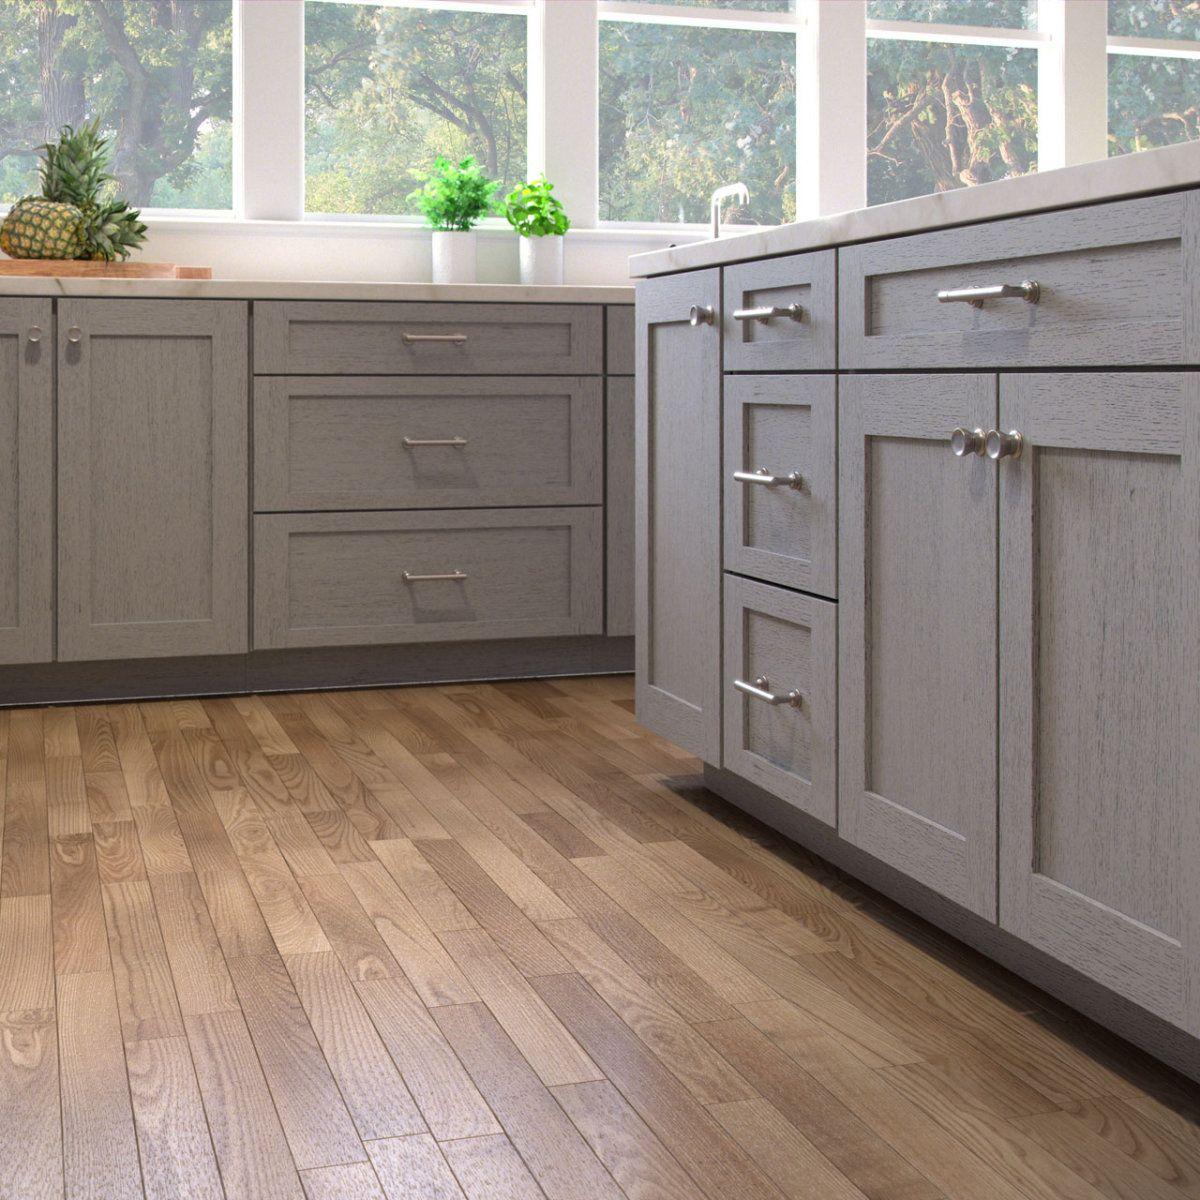 Best Nova Light Grey Shaker Kitchen Base Cabinets Kitchen 400 x 300